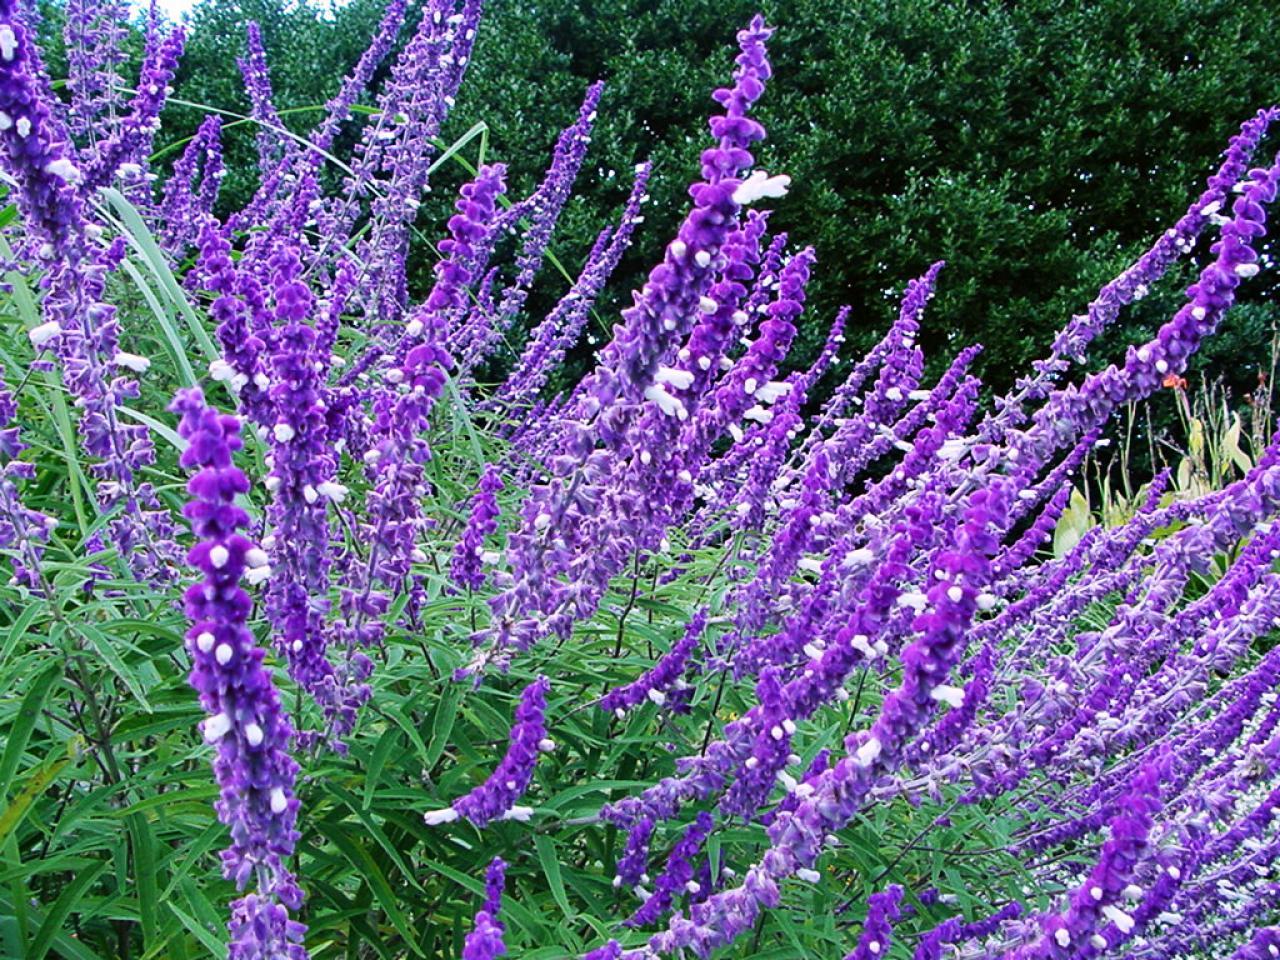 Purple Perennials For Zone 7 Salvia Home Garden Ideas